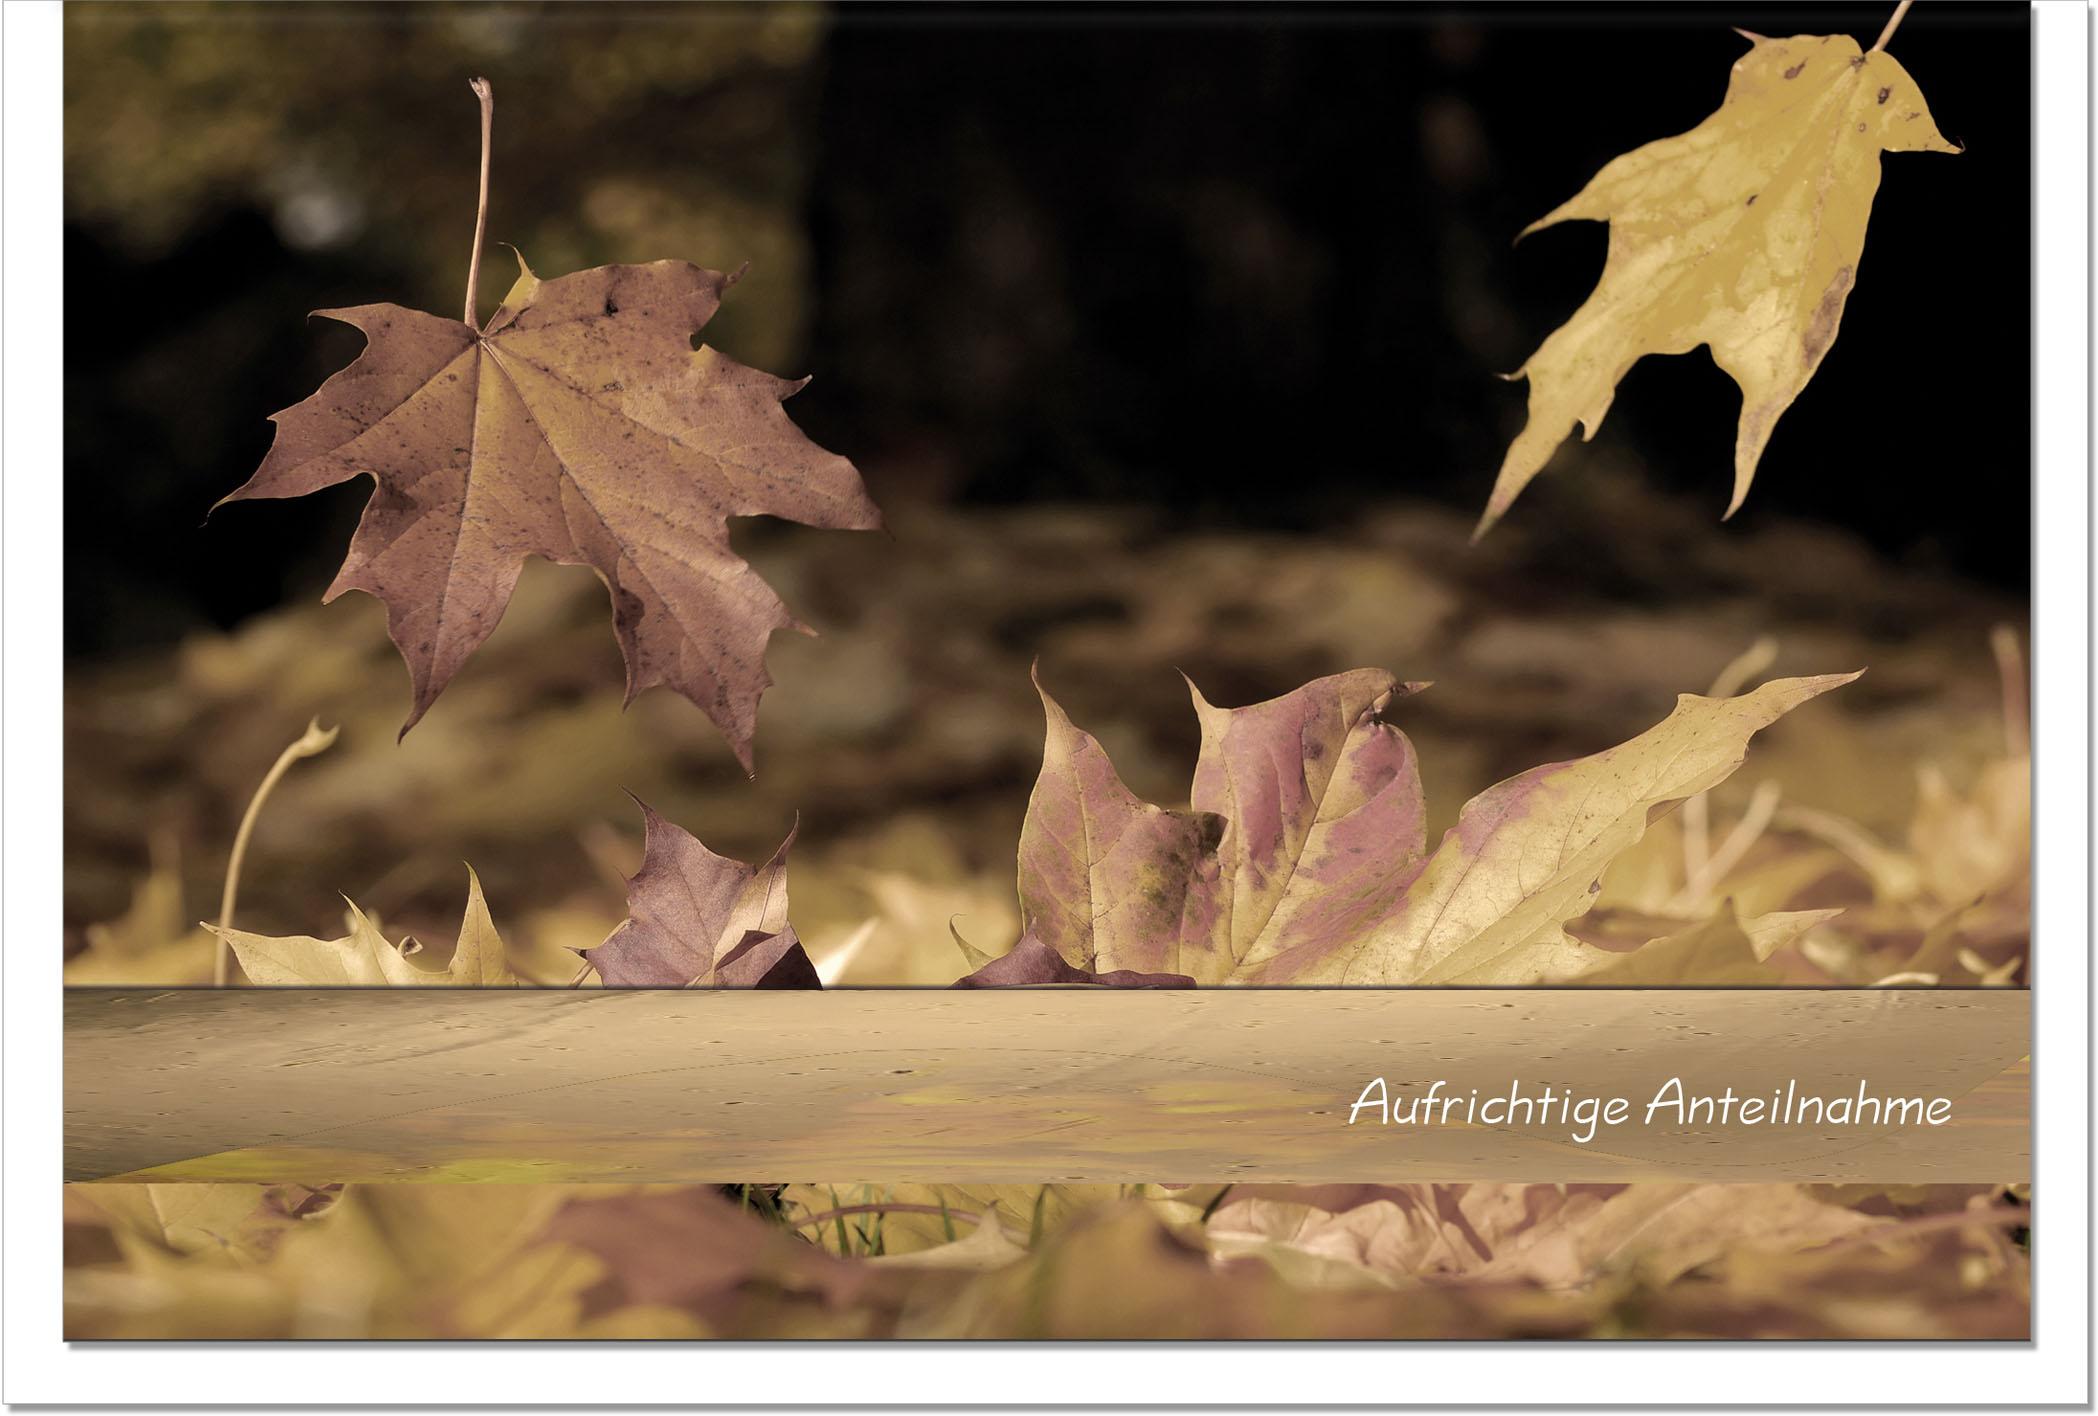 Trauerkarte ABSCHIED | Herbstlaub | metALUm #00029